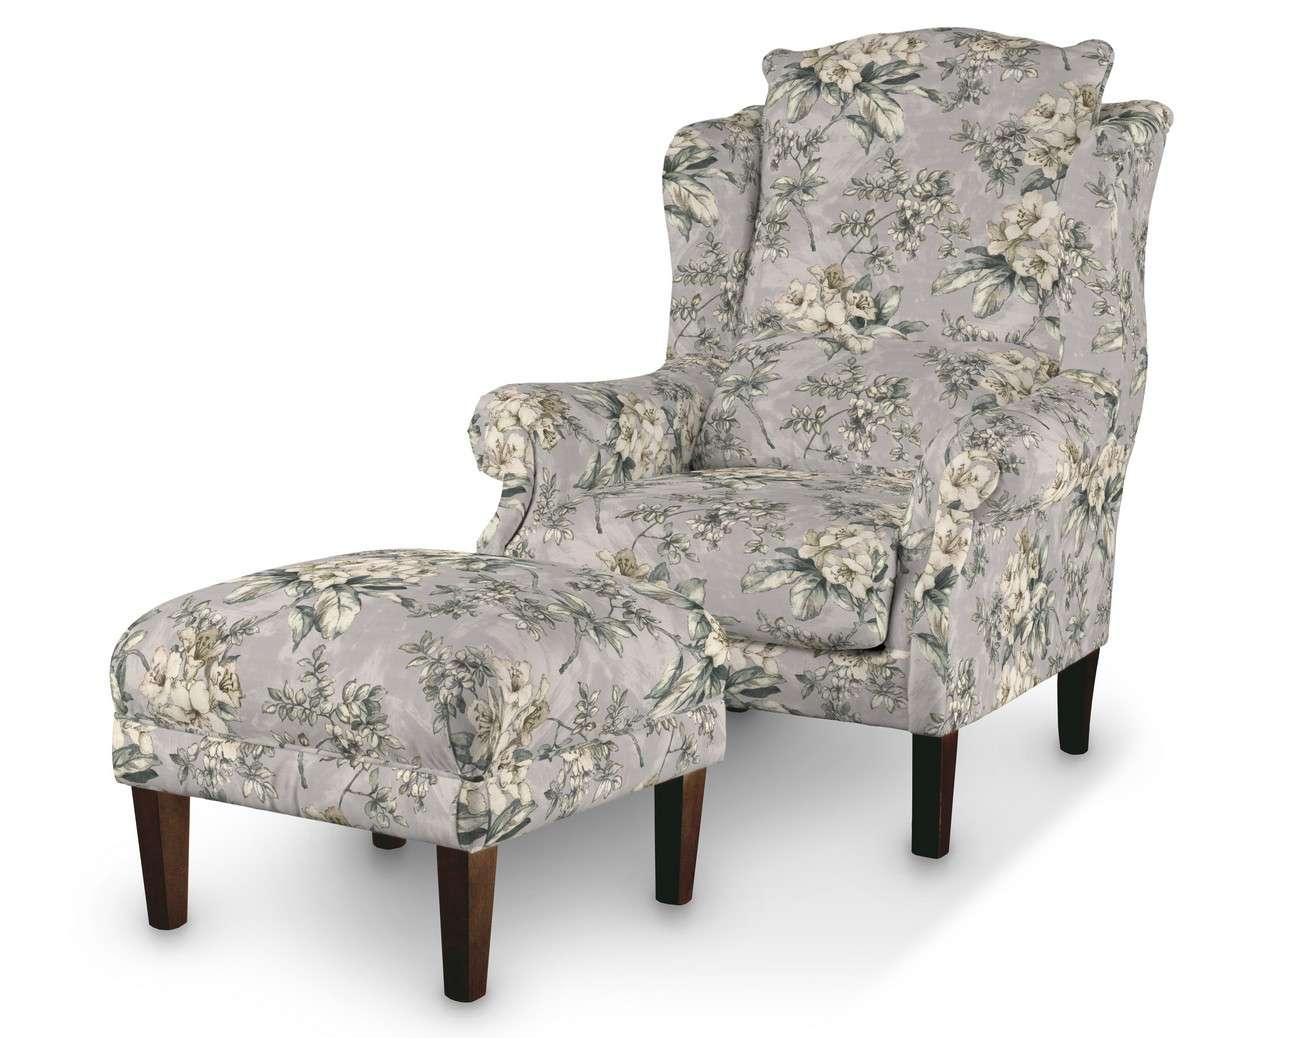 Podnóżek do fotela w kolekcji Londres, tkanina: 143-36